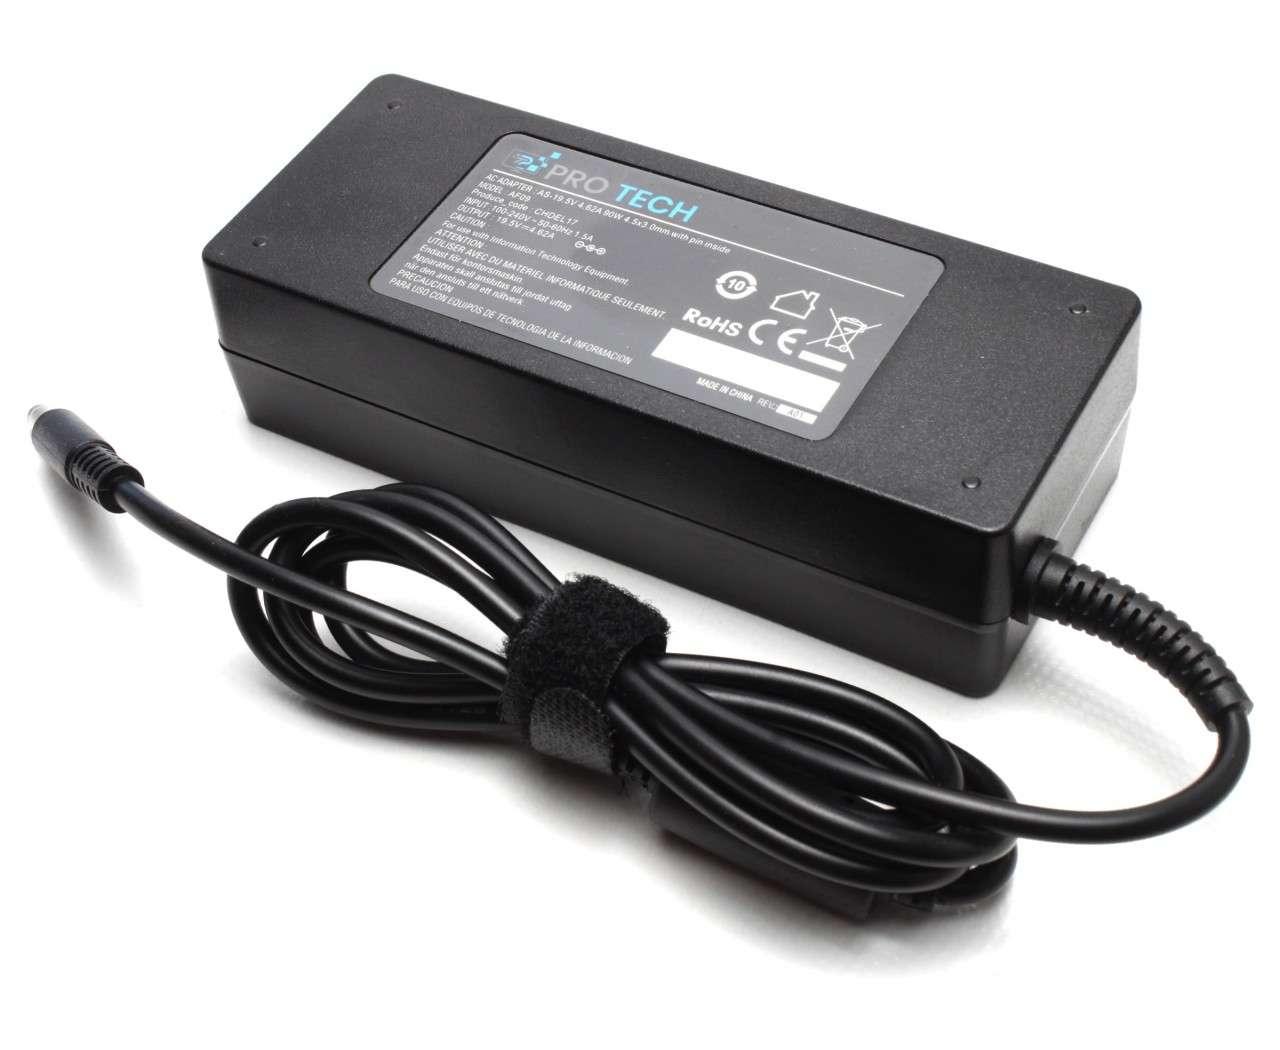 Incarcator Dell Vostro 15 3558 90W Replacement imagine powerlaptop.ro 2021